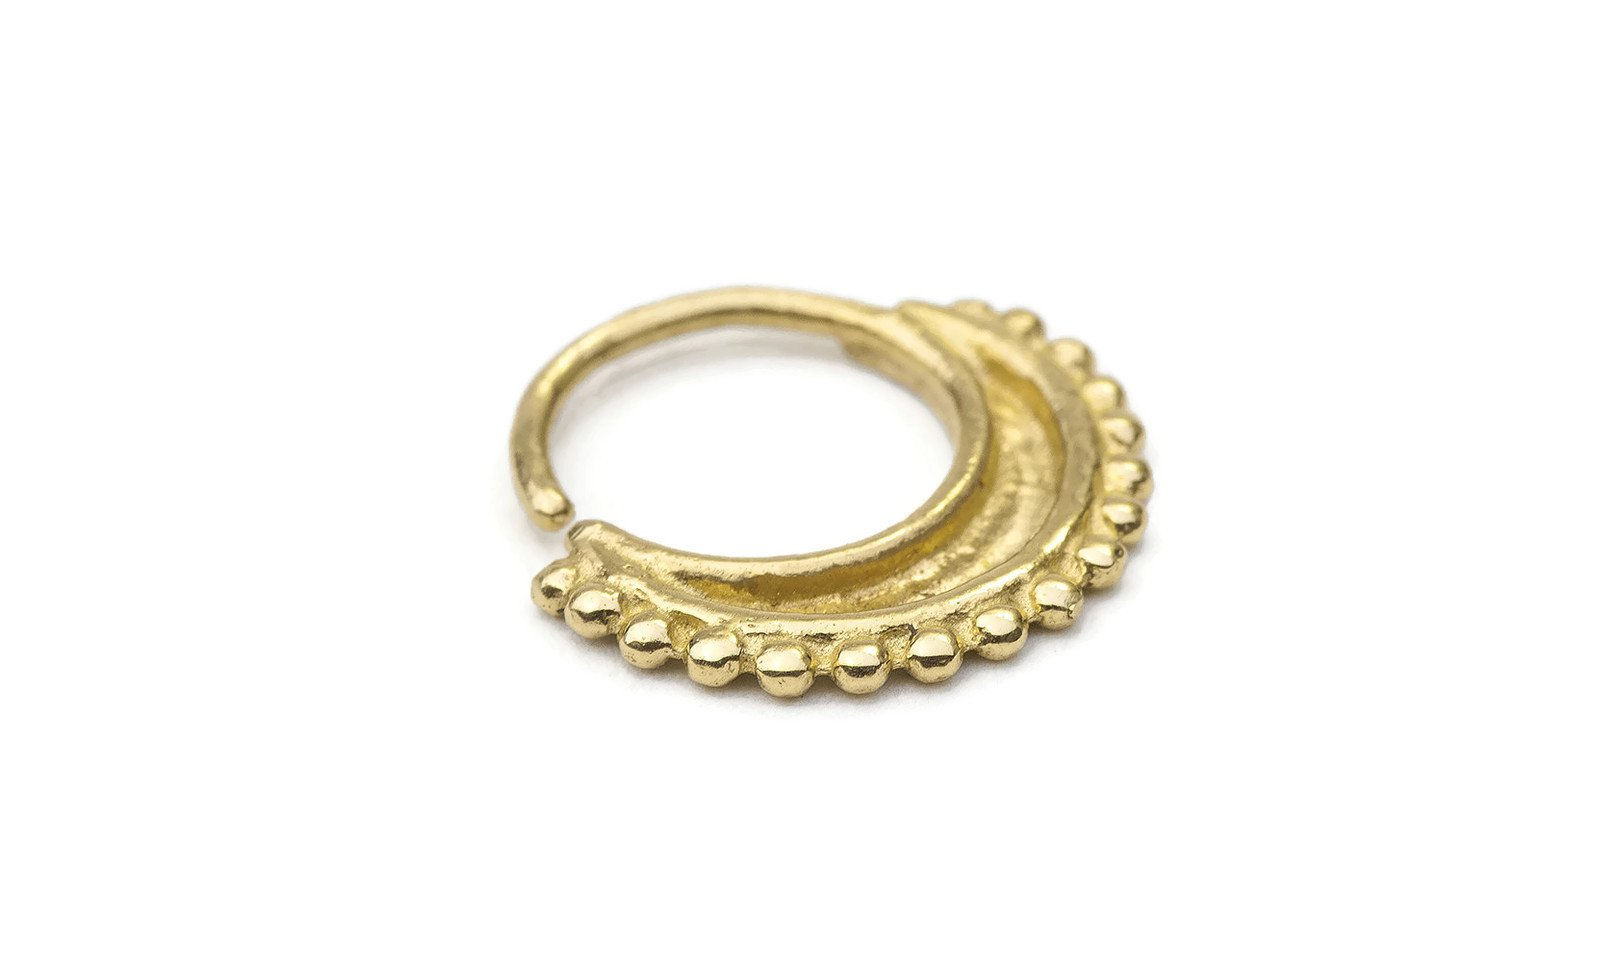 Studio Meme Designer Handmade Nose Rings available in Solid 14k Yellow Gold 18 Gauge 7-9mm